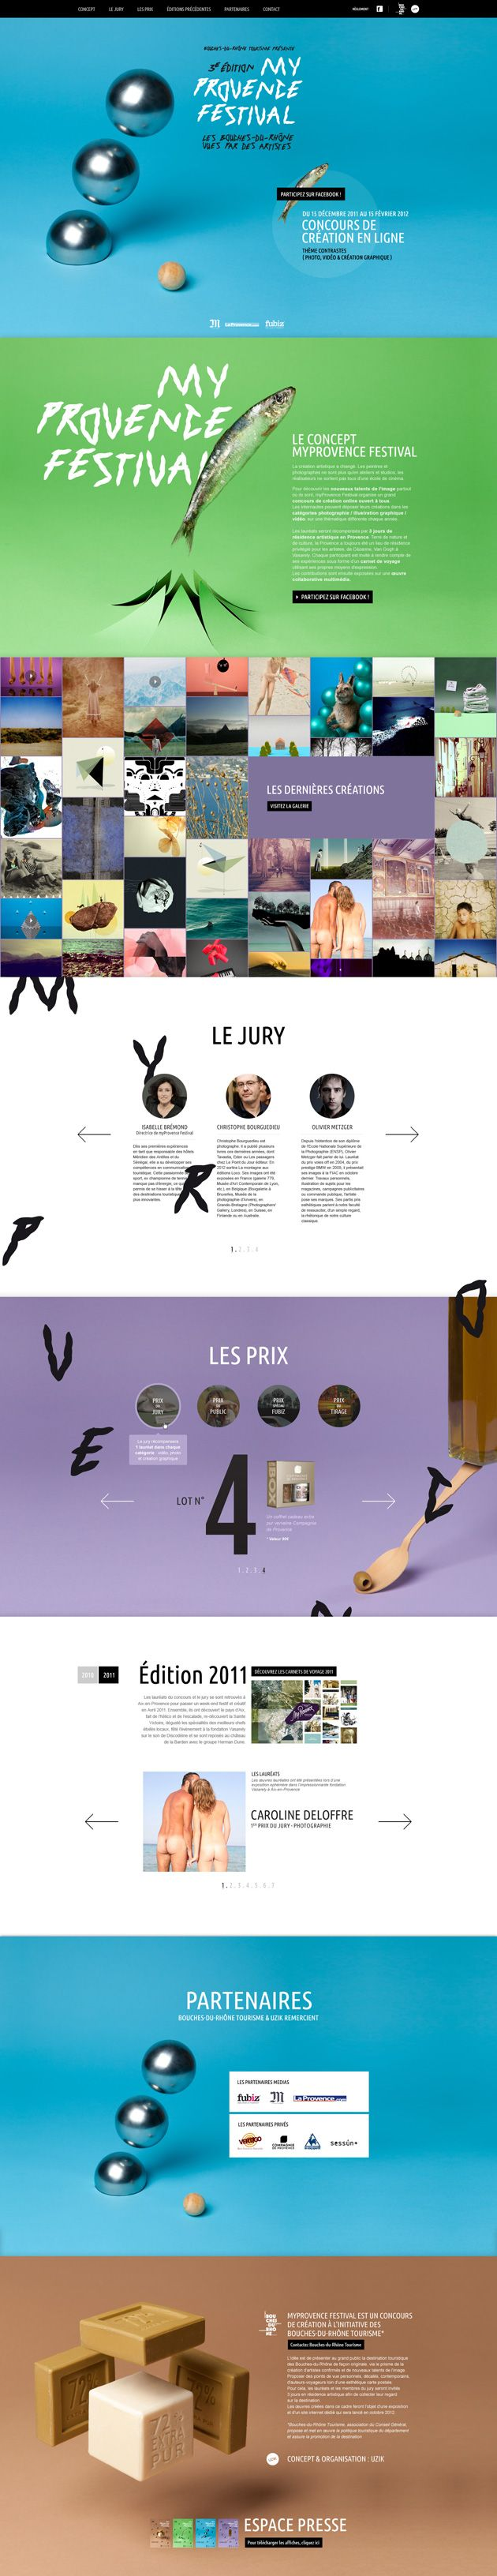 http://www.uzik.com/fiche-portfolio-myprovence-festival #webdesign #design #designer #inspiration #user #interface #ui #web    Stay up to date with daily web design news:  http://www.fb.com/mizkowebdesign